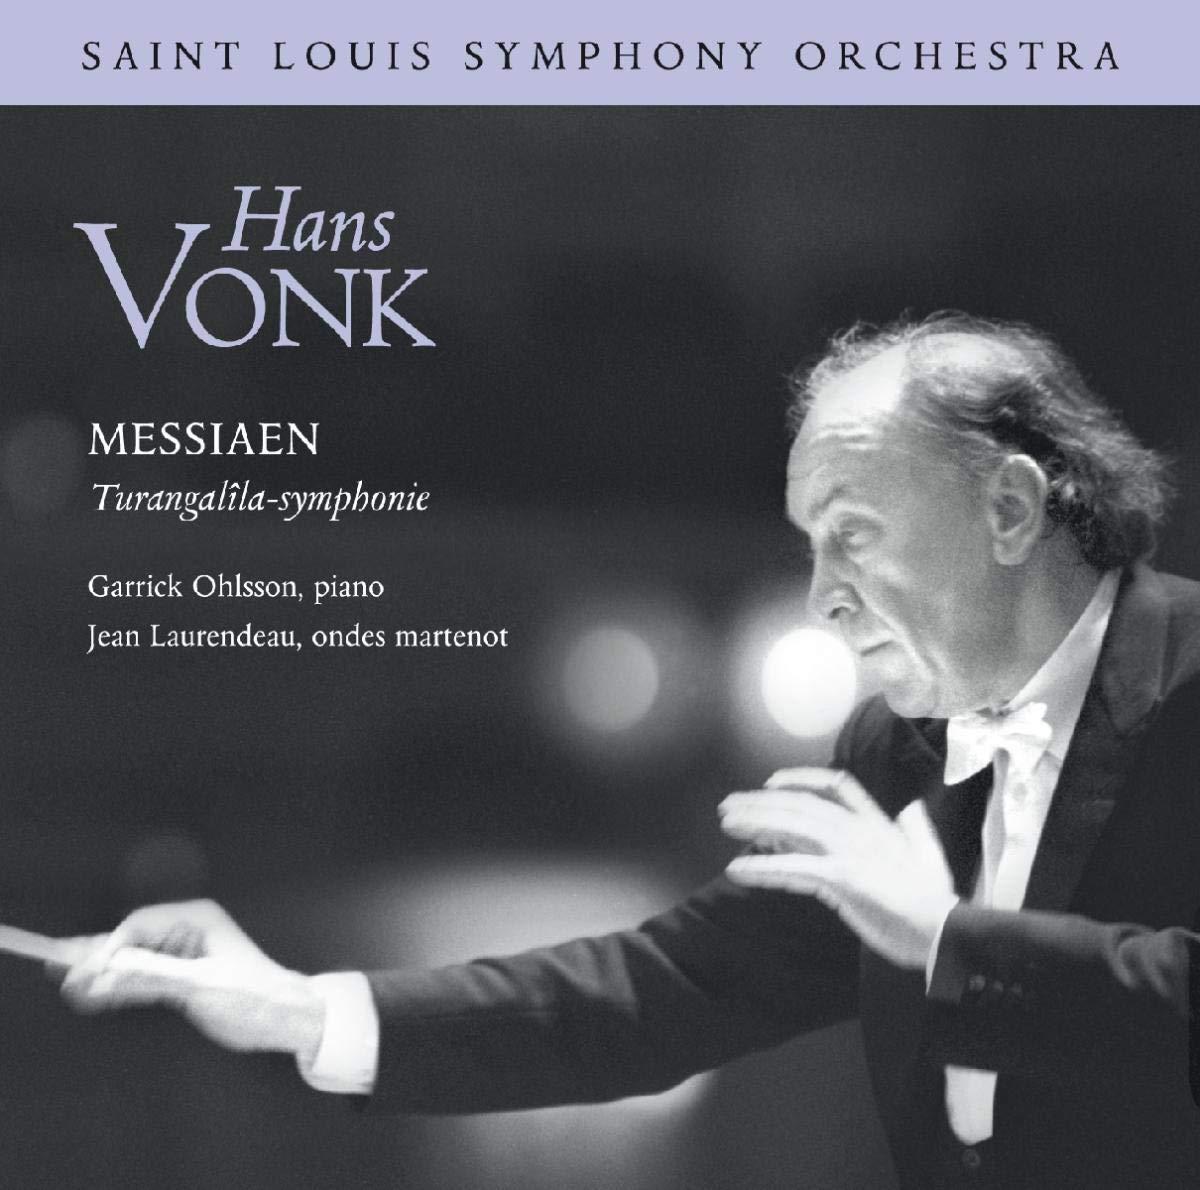 Messiaen - Turangalîla-Symphonie - Page 3 61aPAEodIoL._SL1200_